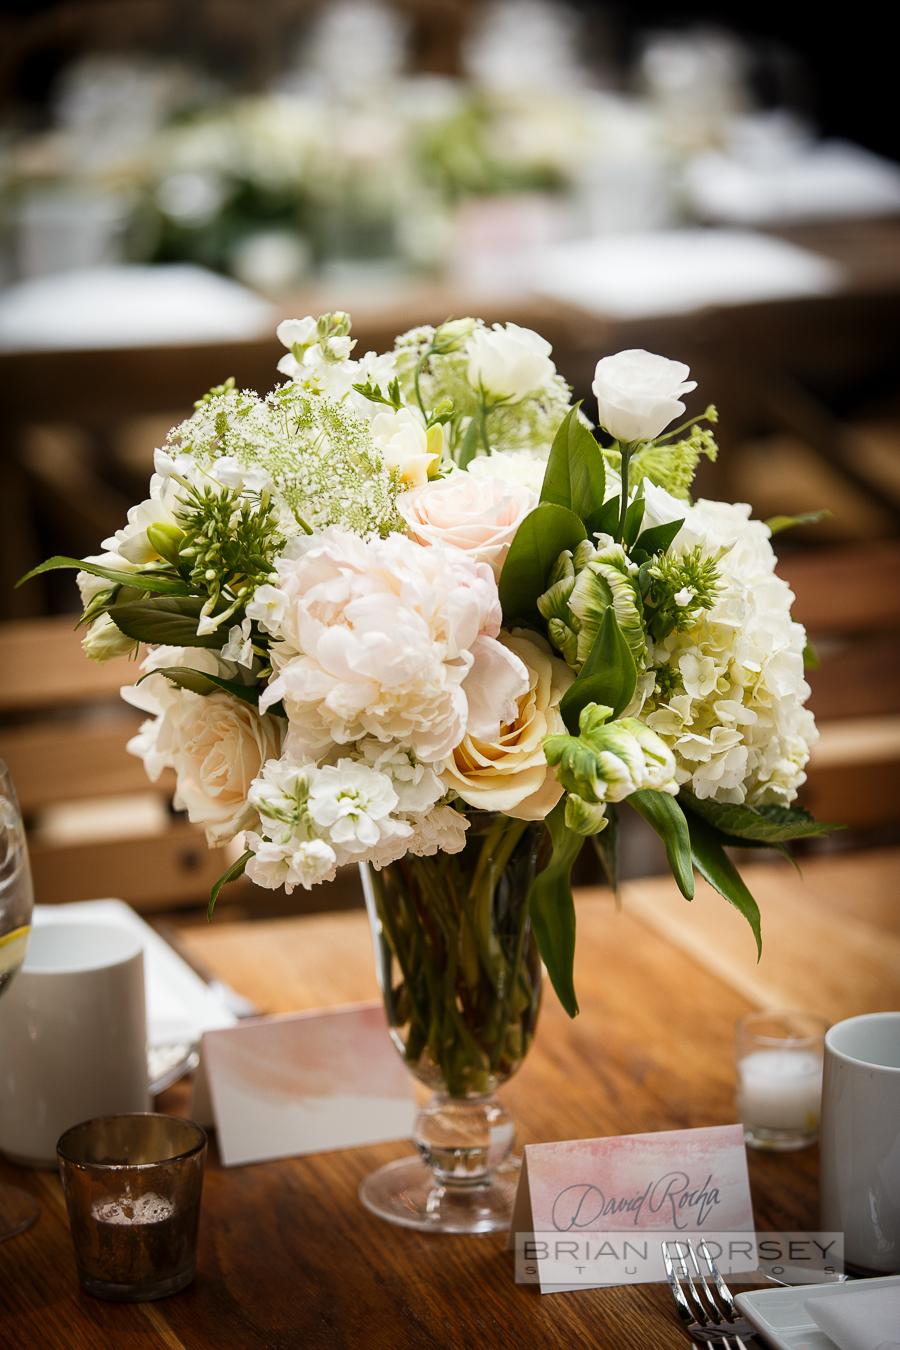 isola nomo soho hotel wedding brian dorsey studios ang weddings and events-24.jpg